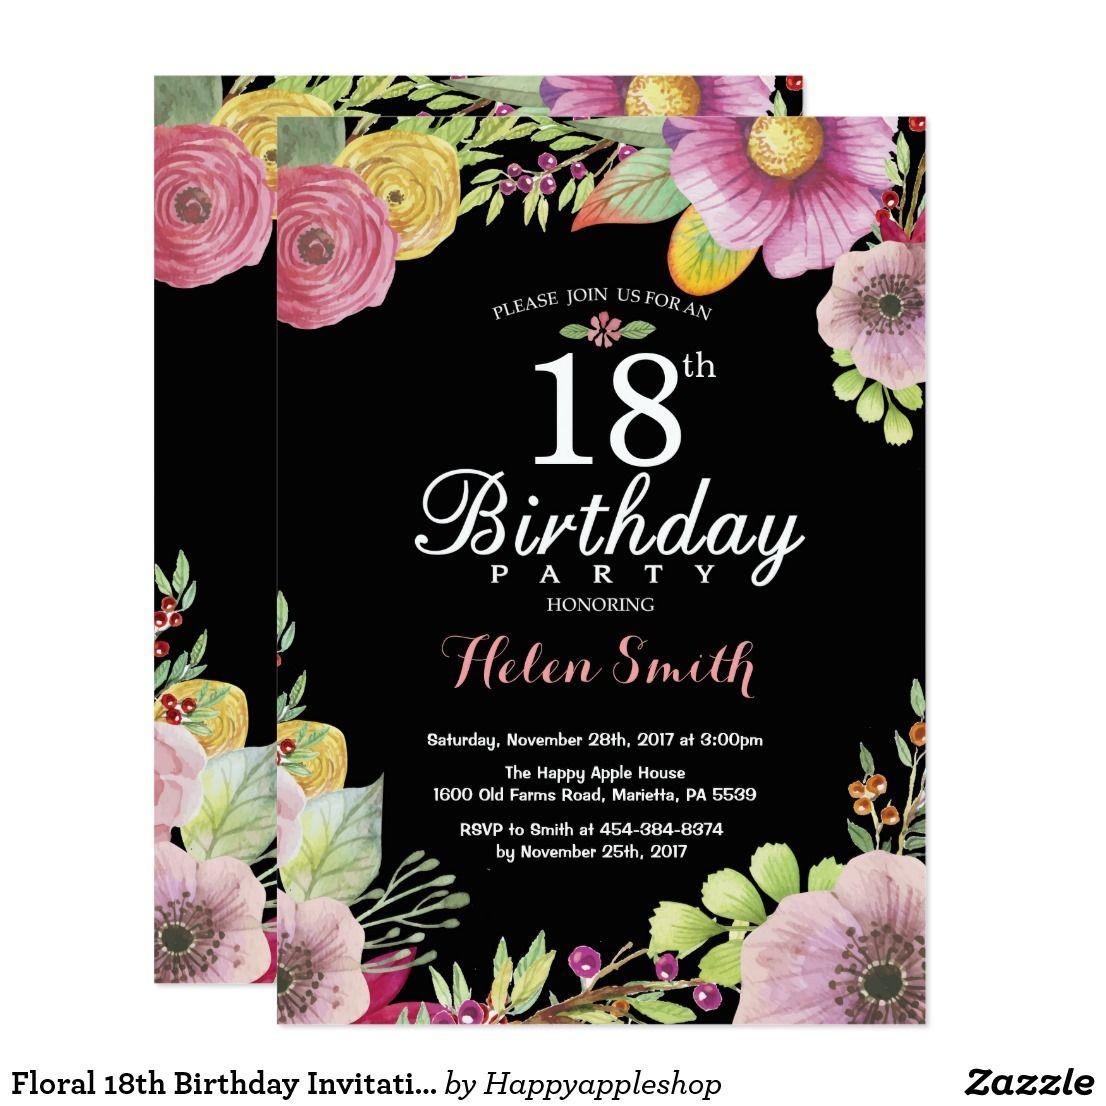 Floral 18th Birthday Invitation for Women | Birthday bash and Birthdays